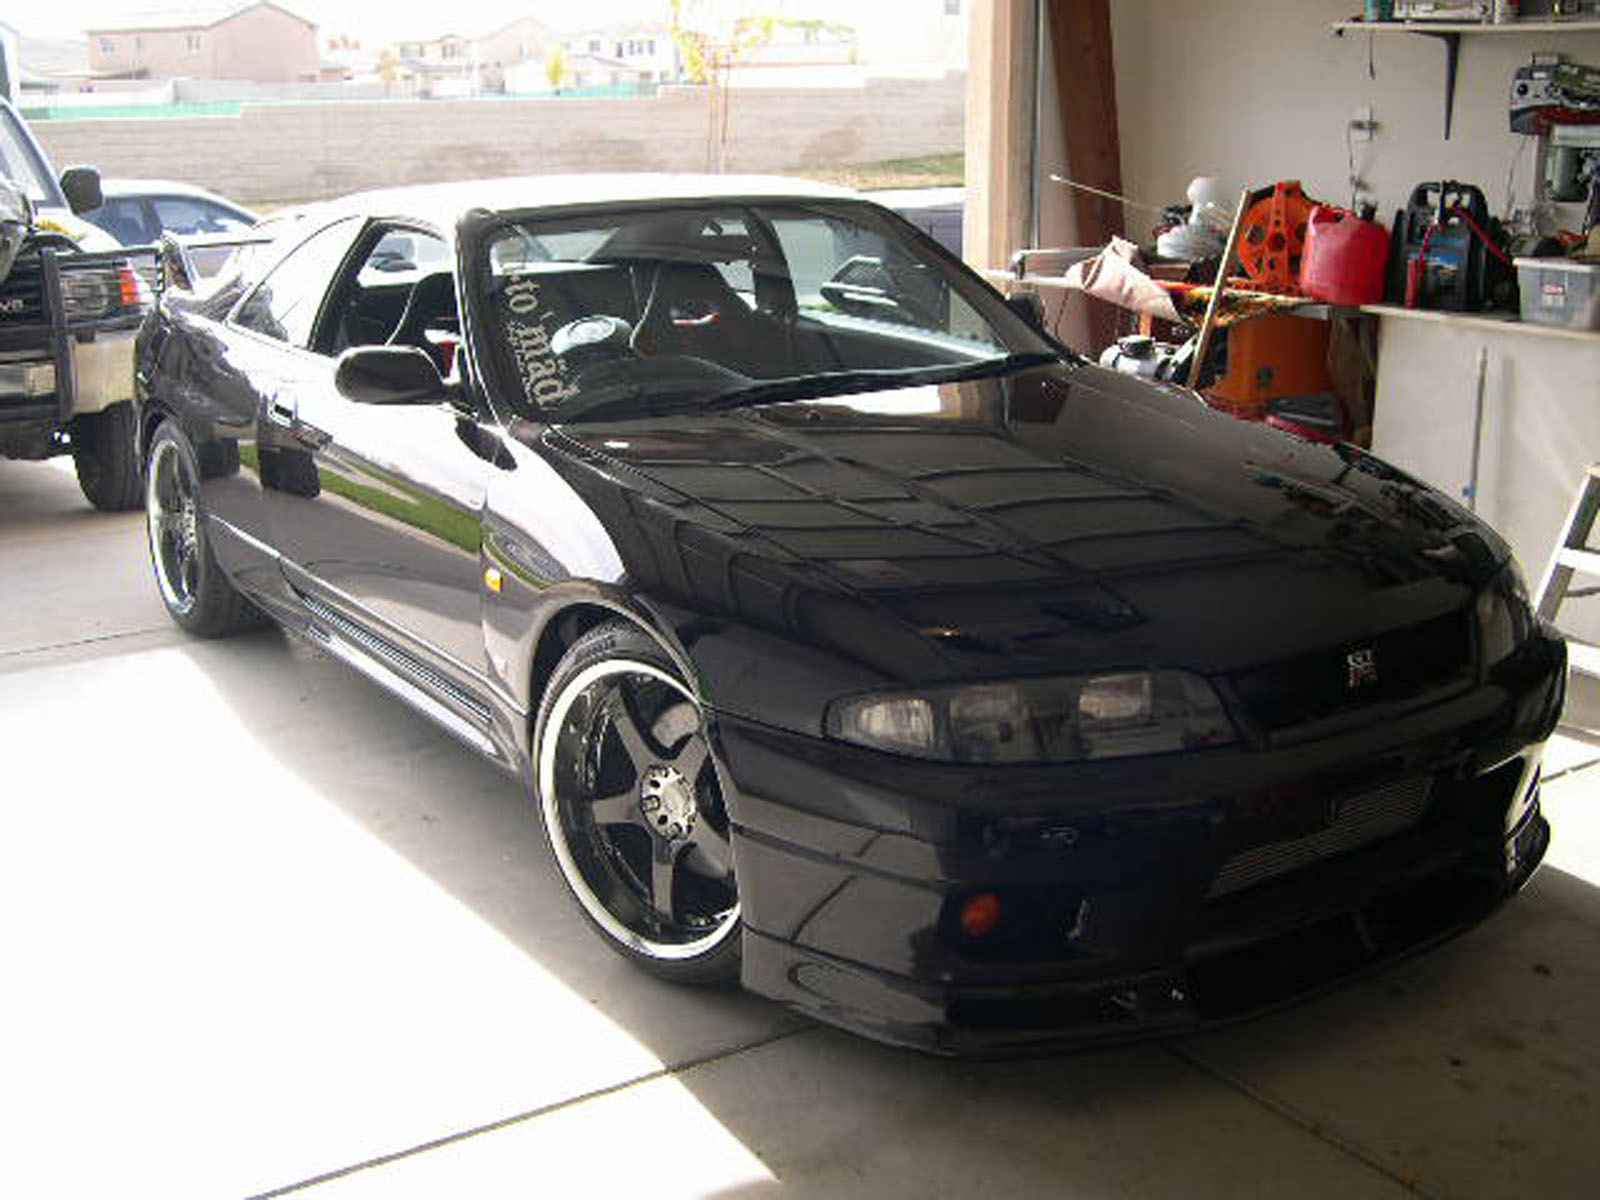 1995 Nissan Skyline For Sale 1995 Nissan Skyline For Sale